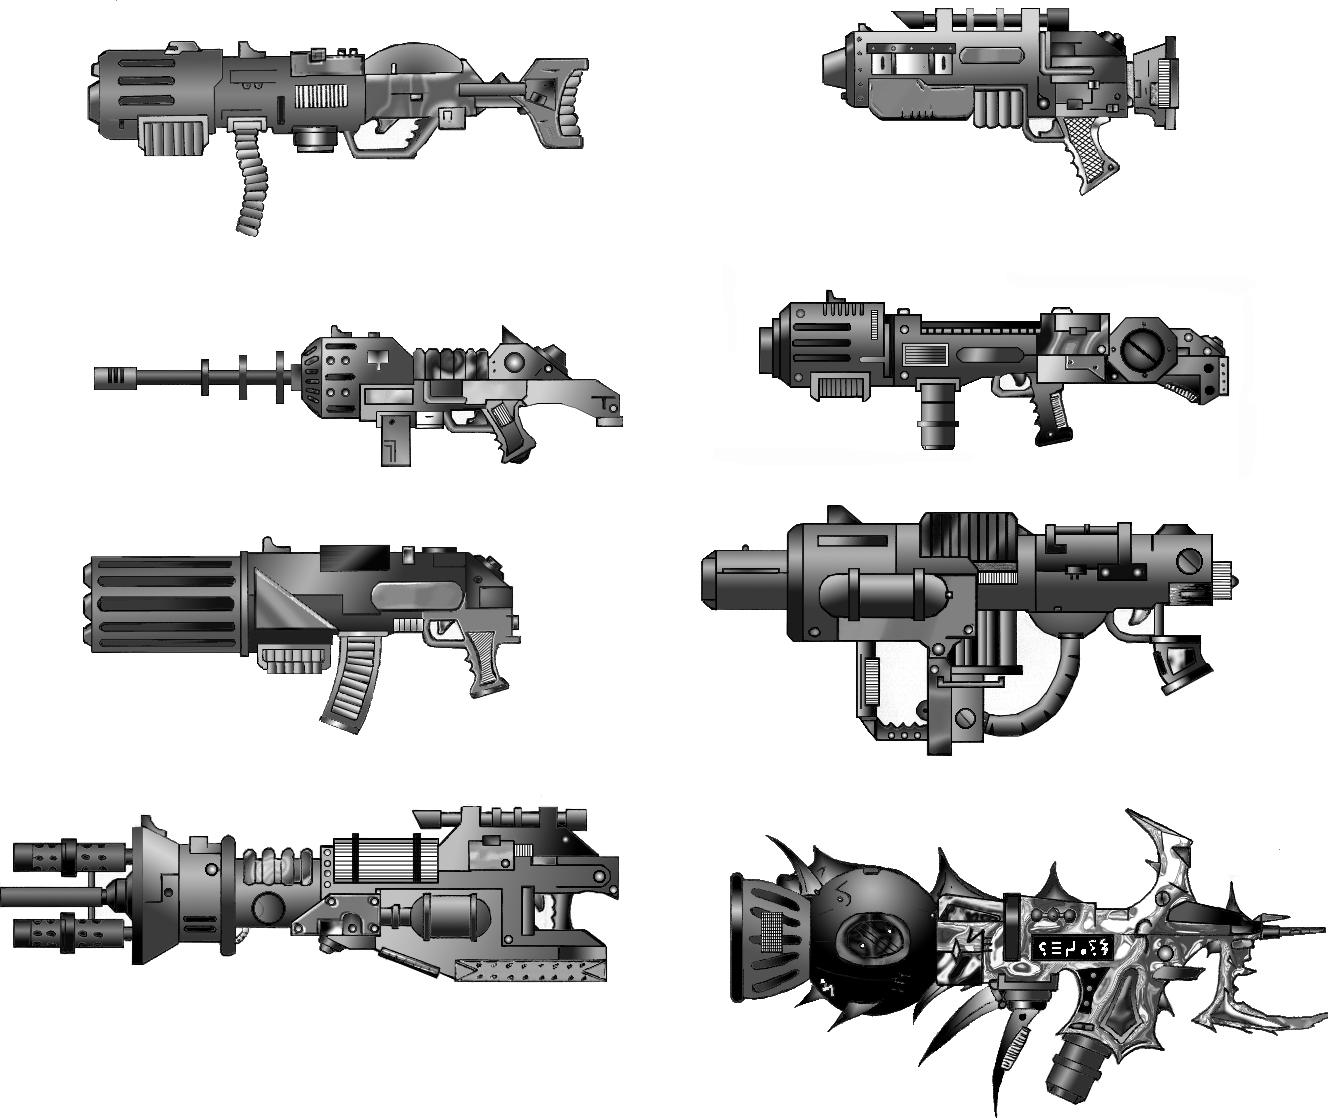 Drawn shotgun weapon Weapon Weapon by by juanosarg